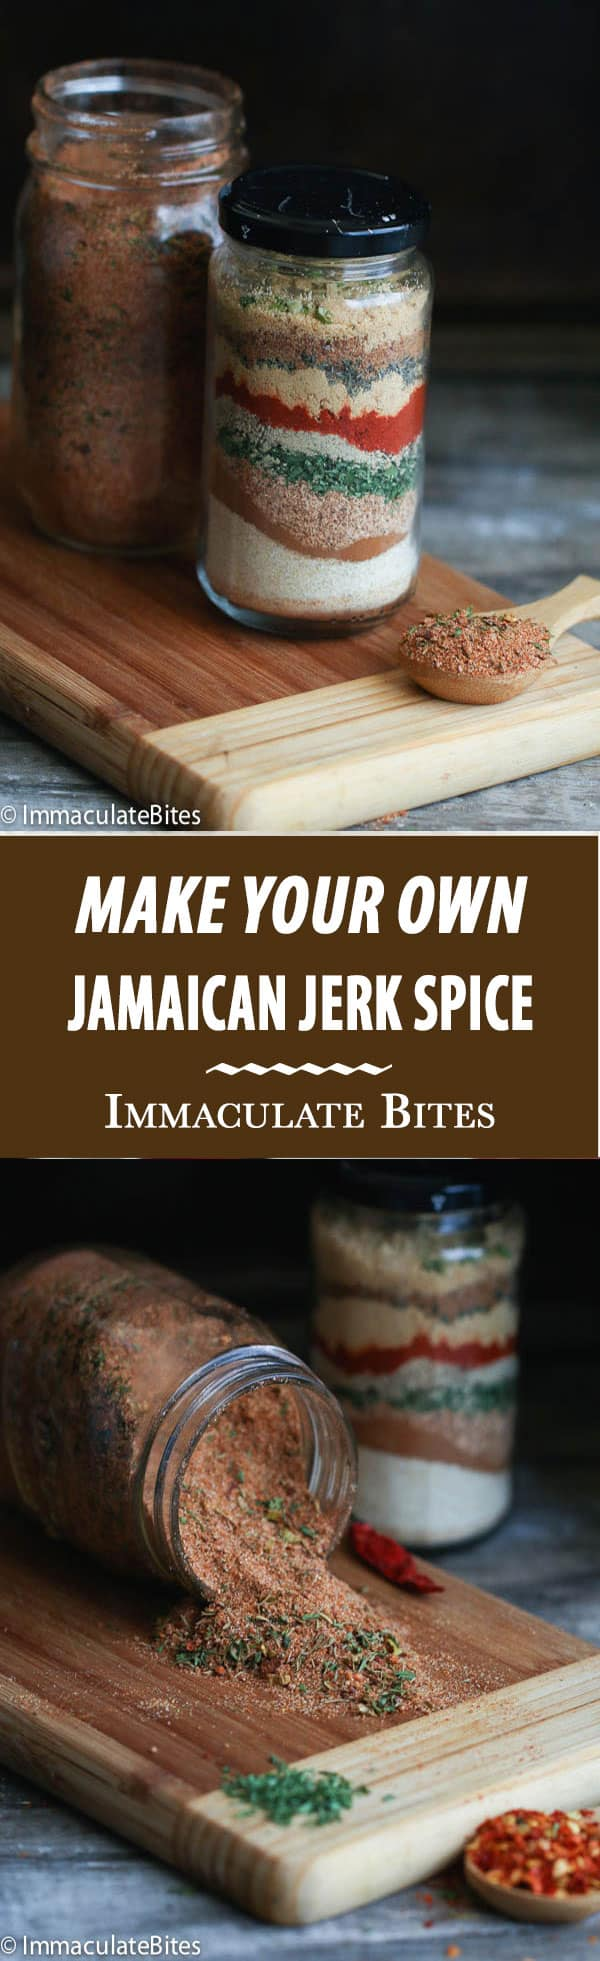 JAMAICAN-SPICE